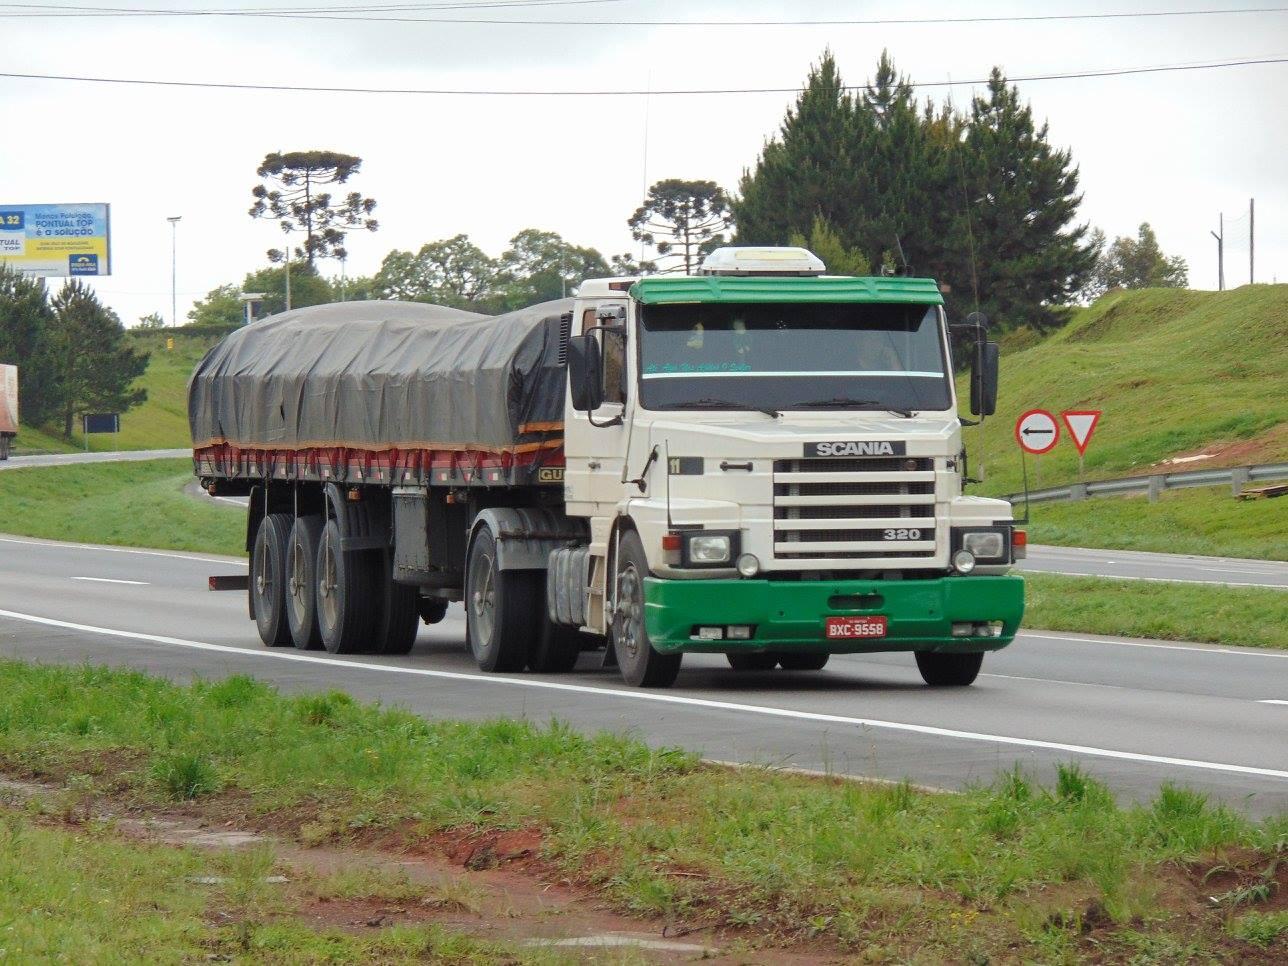 Scania-photo-5-1--2015-49